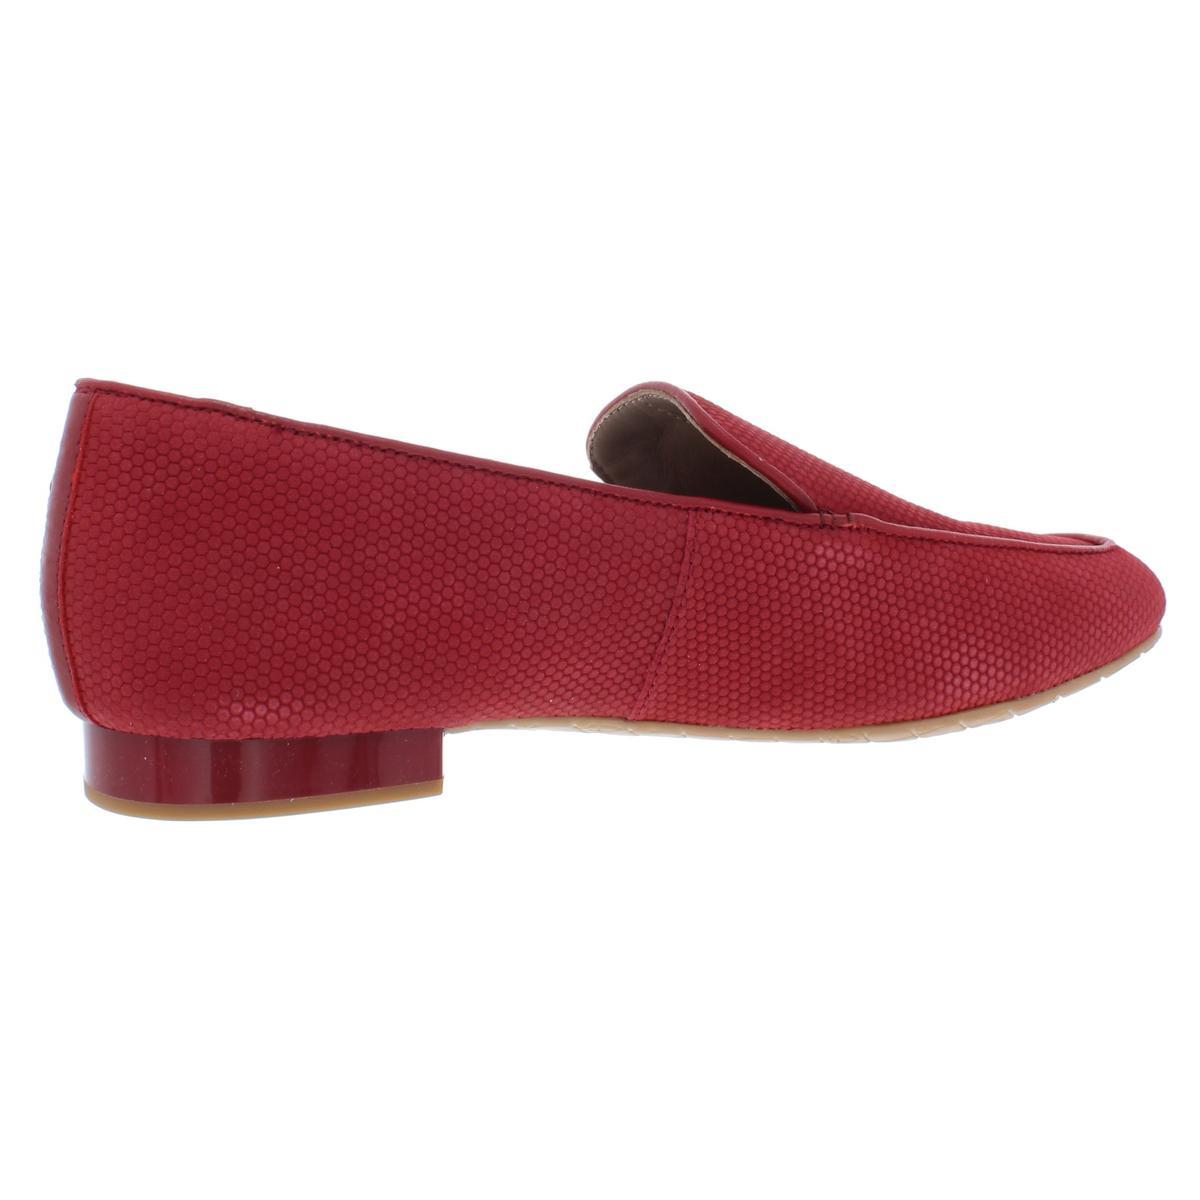 Donald-J-Pliner-Womens-Honey-Slip-On-Loafers-Shoes-BHFO-7808 thumbnail 6